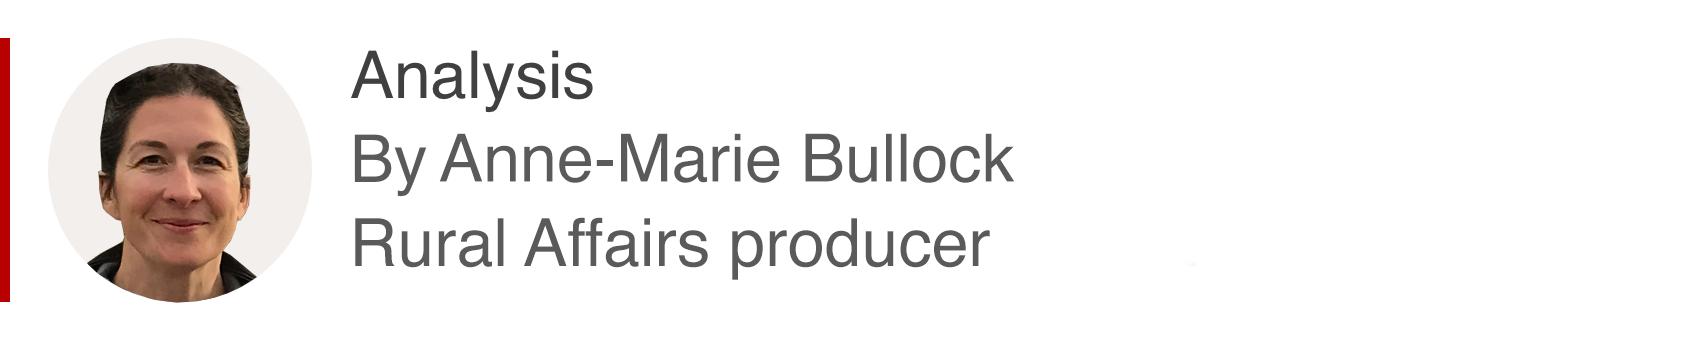 Anne-Marie Bullock analysis box